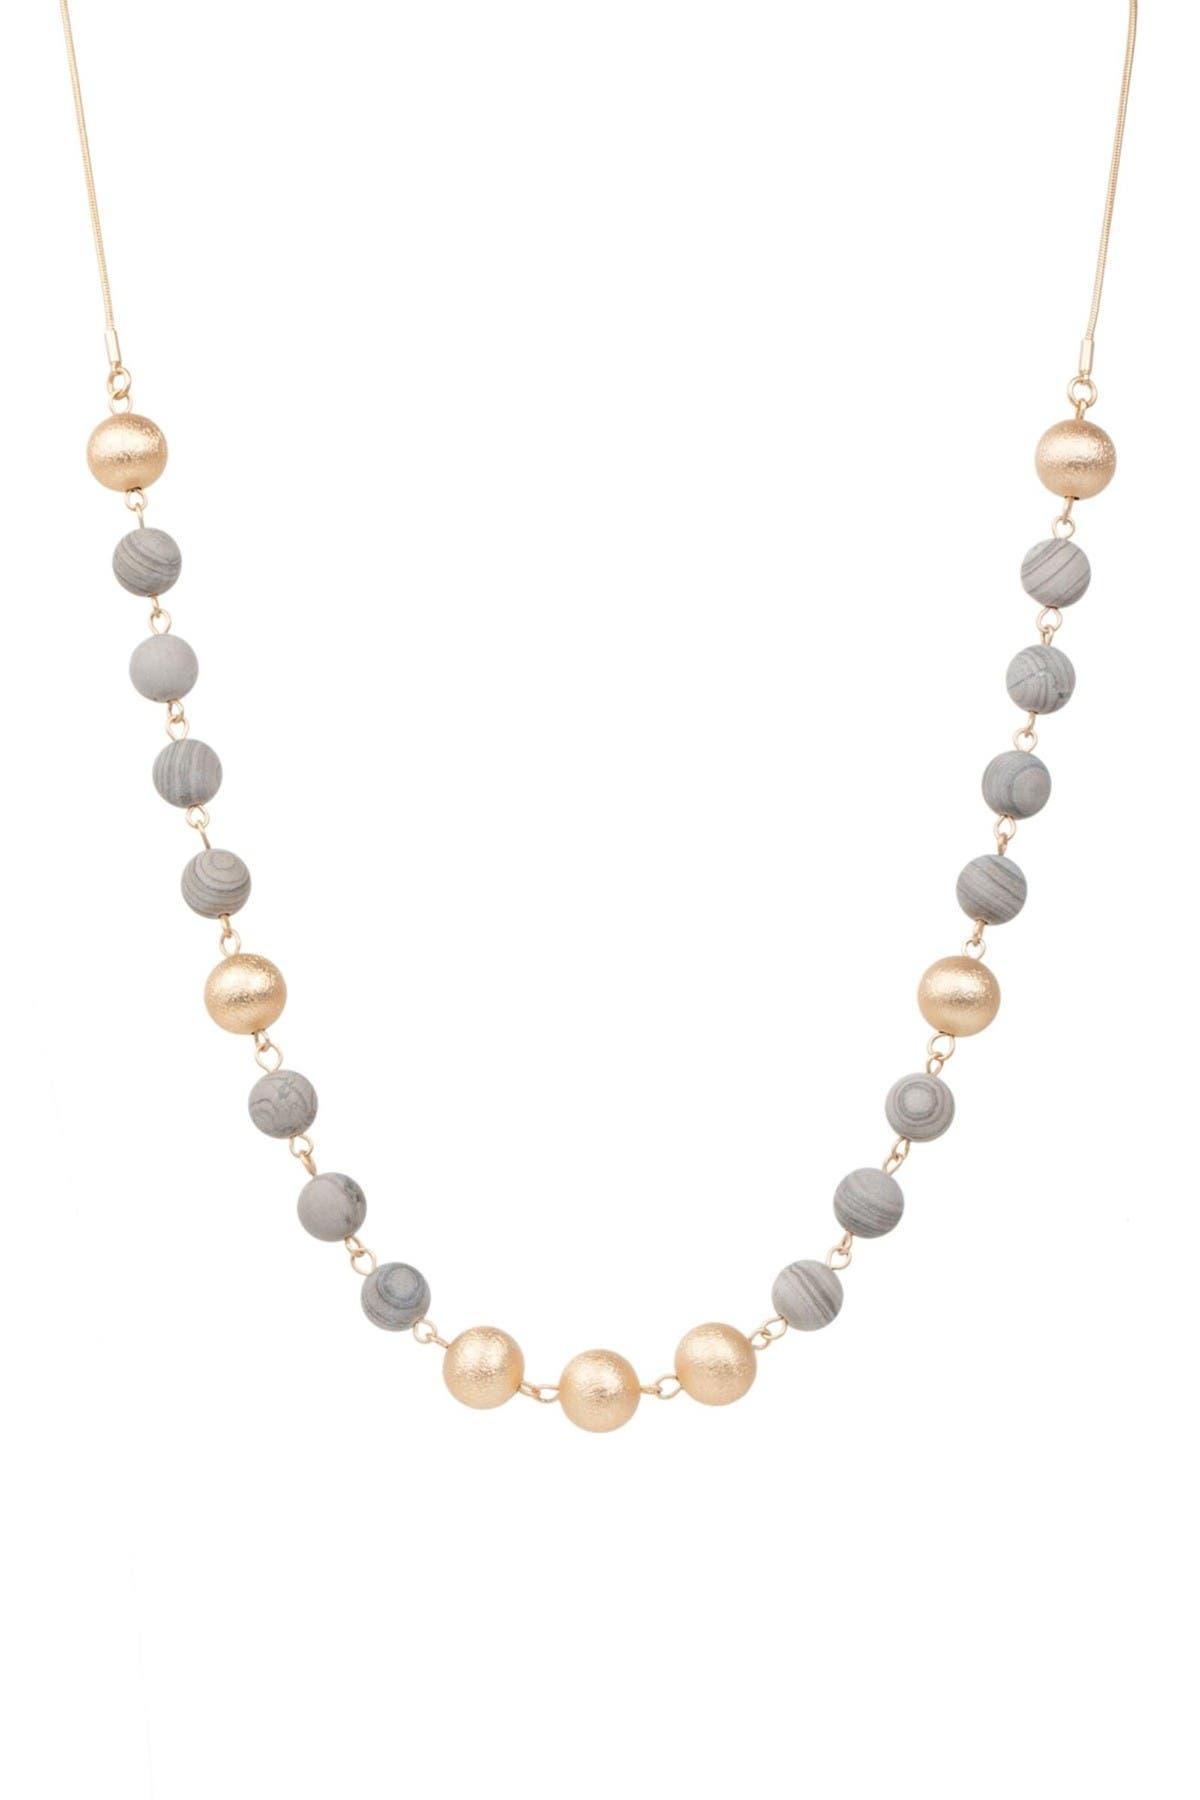 Image of Saachi Olivine Natural Stone Beaded Necklace